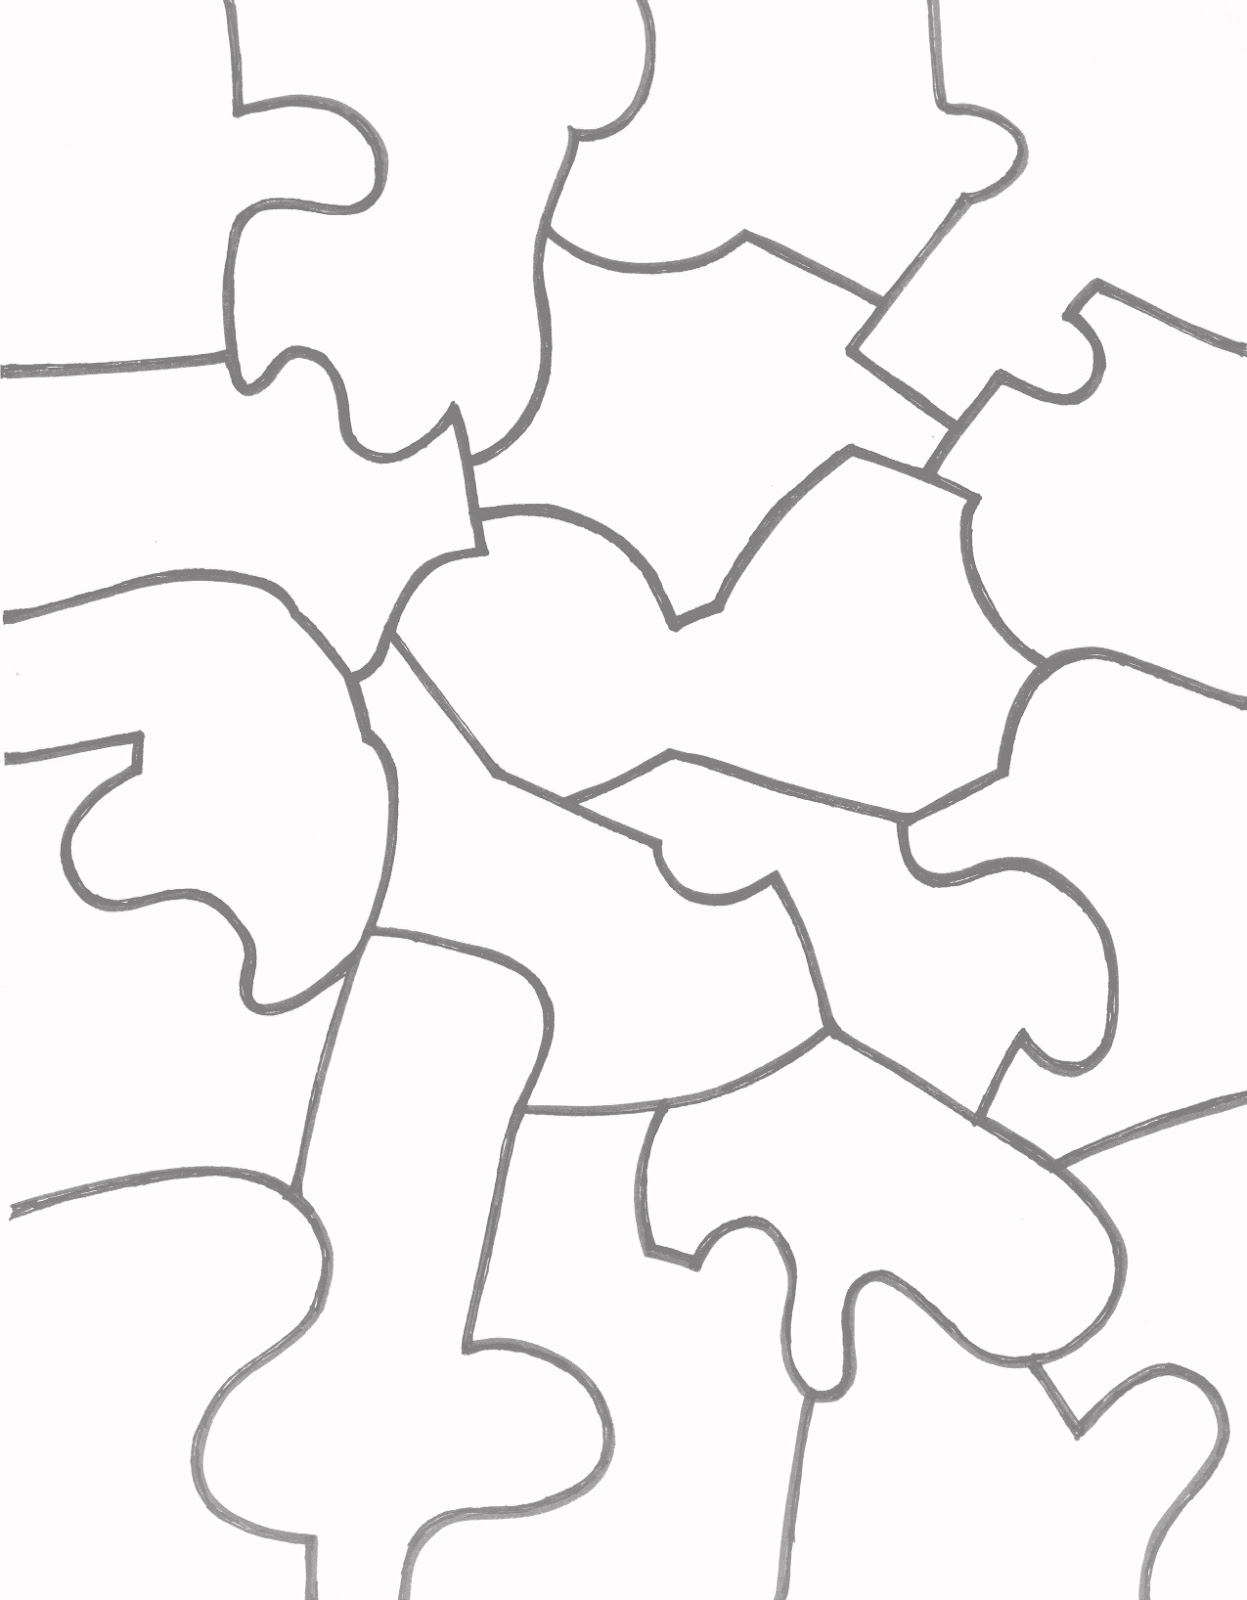 Puzzle Template. colorir e pintar desenho feito a lápis. jigsaw ...